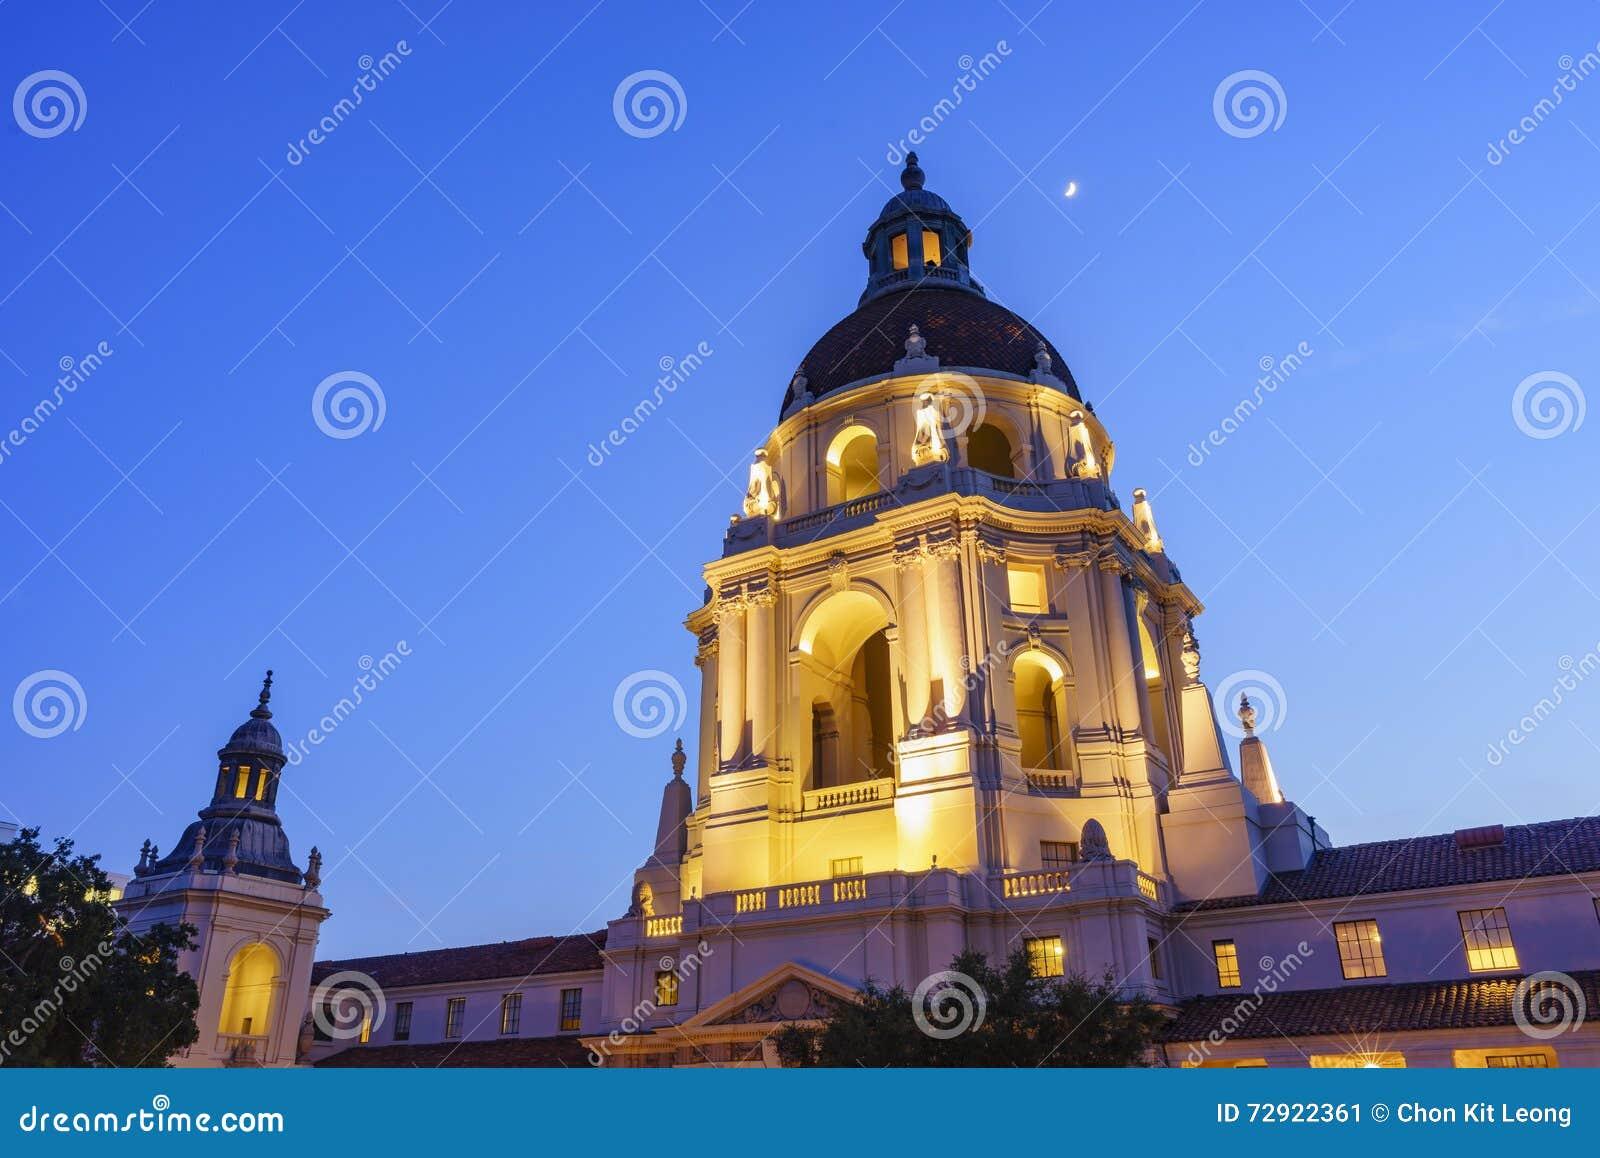 Het mooie Stadhuis van Pasadena dichtbij Los Angeles, Californië